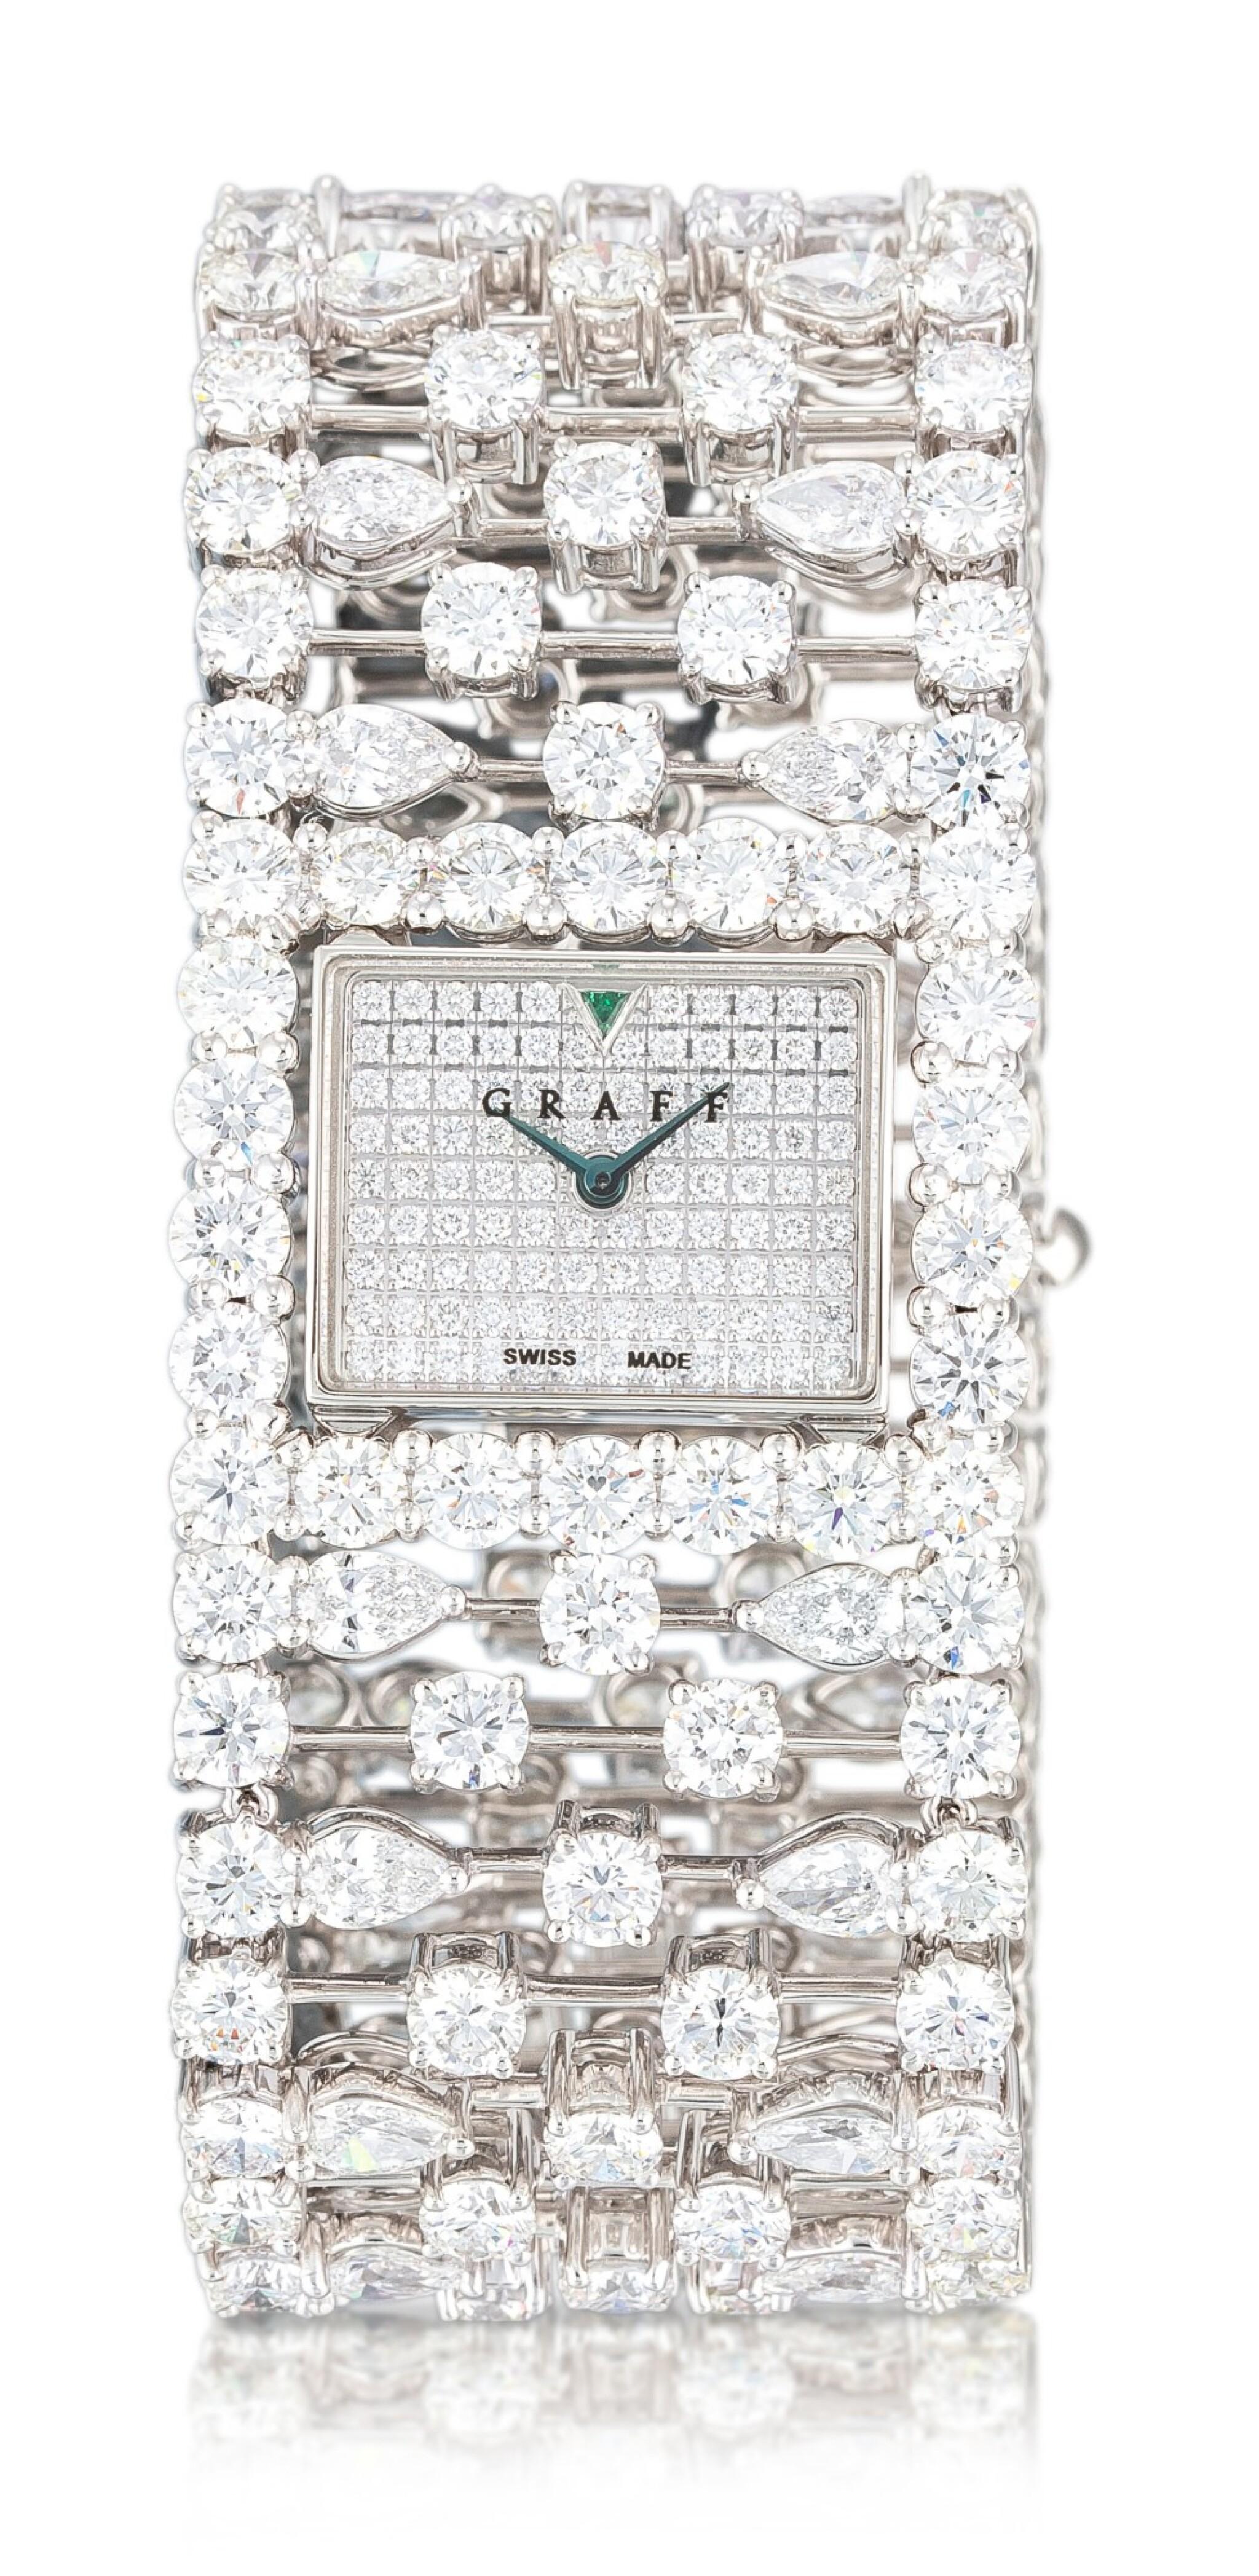 View 1 of Lot 1027. 'Graff Lace' Reference MA20WGDD, Limited Edition White Gold and Diamond-Set Wristwatch | 格拉夫| Graff Lace編號MA20WGDD,限量版白金鑲鑽石腕表,約2010年製.